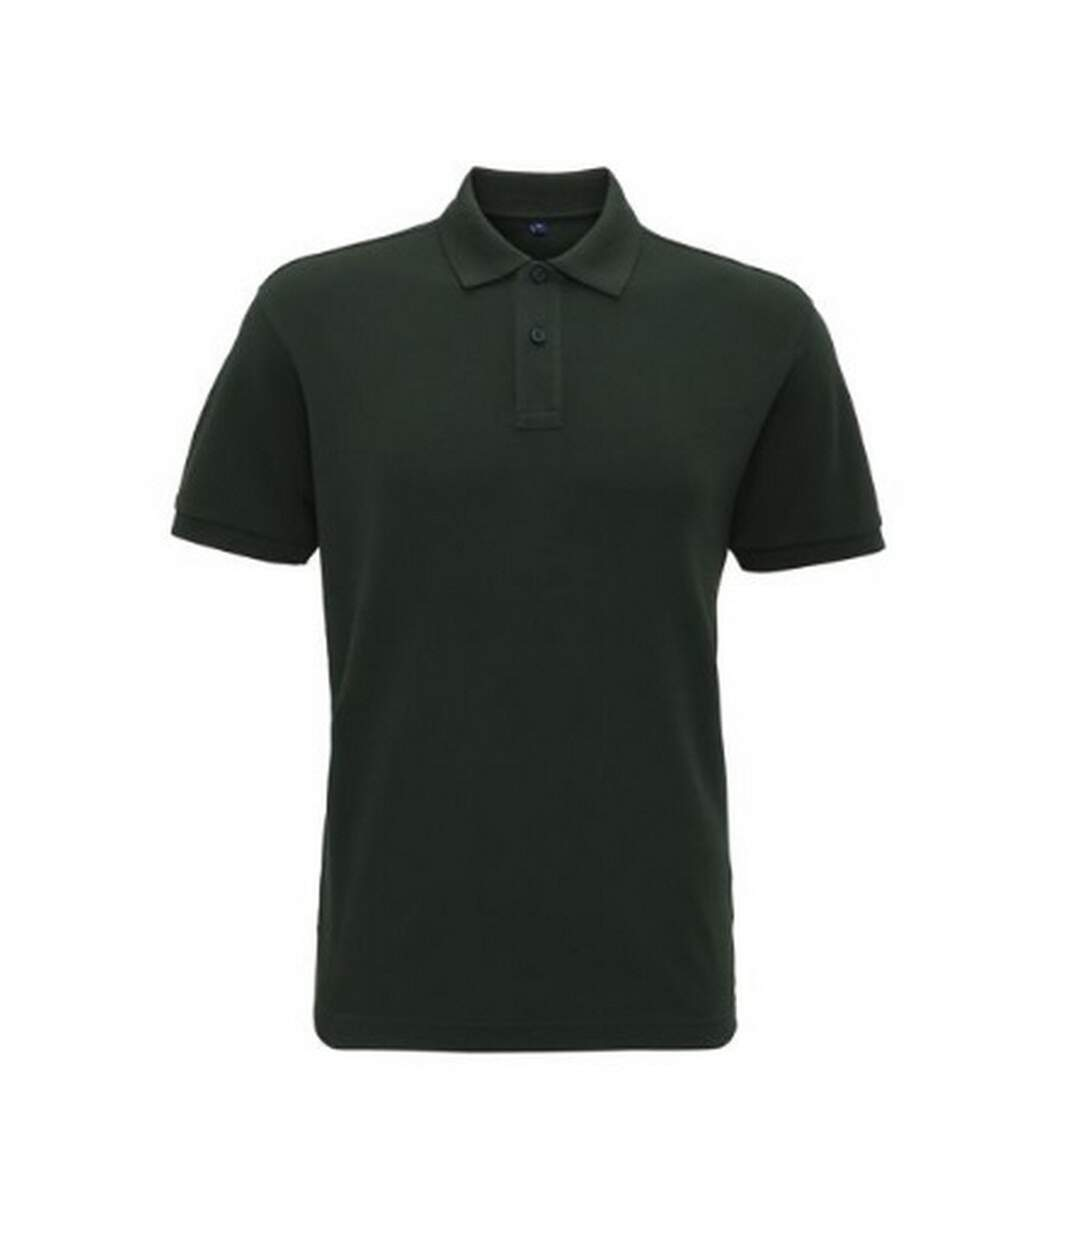 Asquith & Fox Mens Super Smooth Knit Polo Shirt (Bottle) - UTRW6026